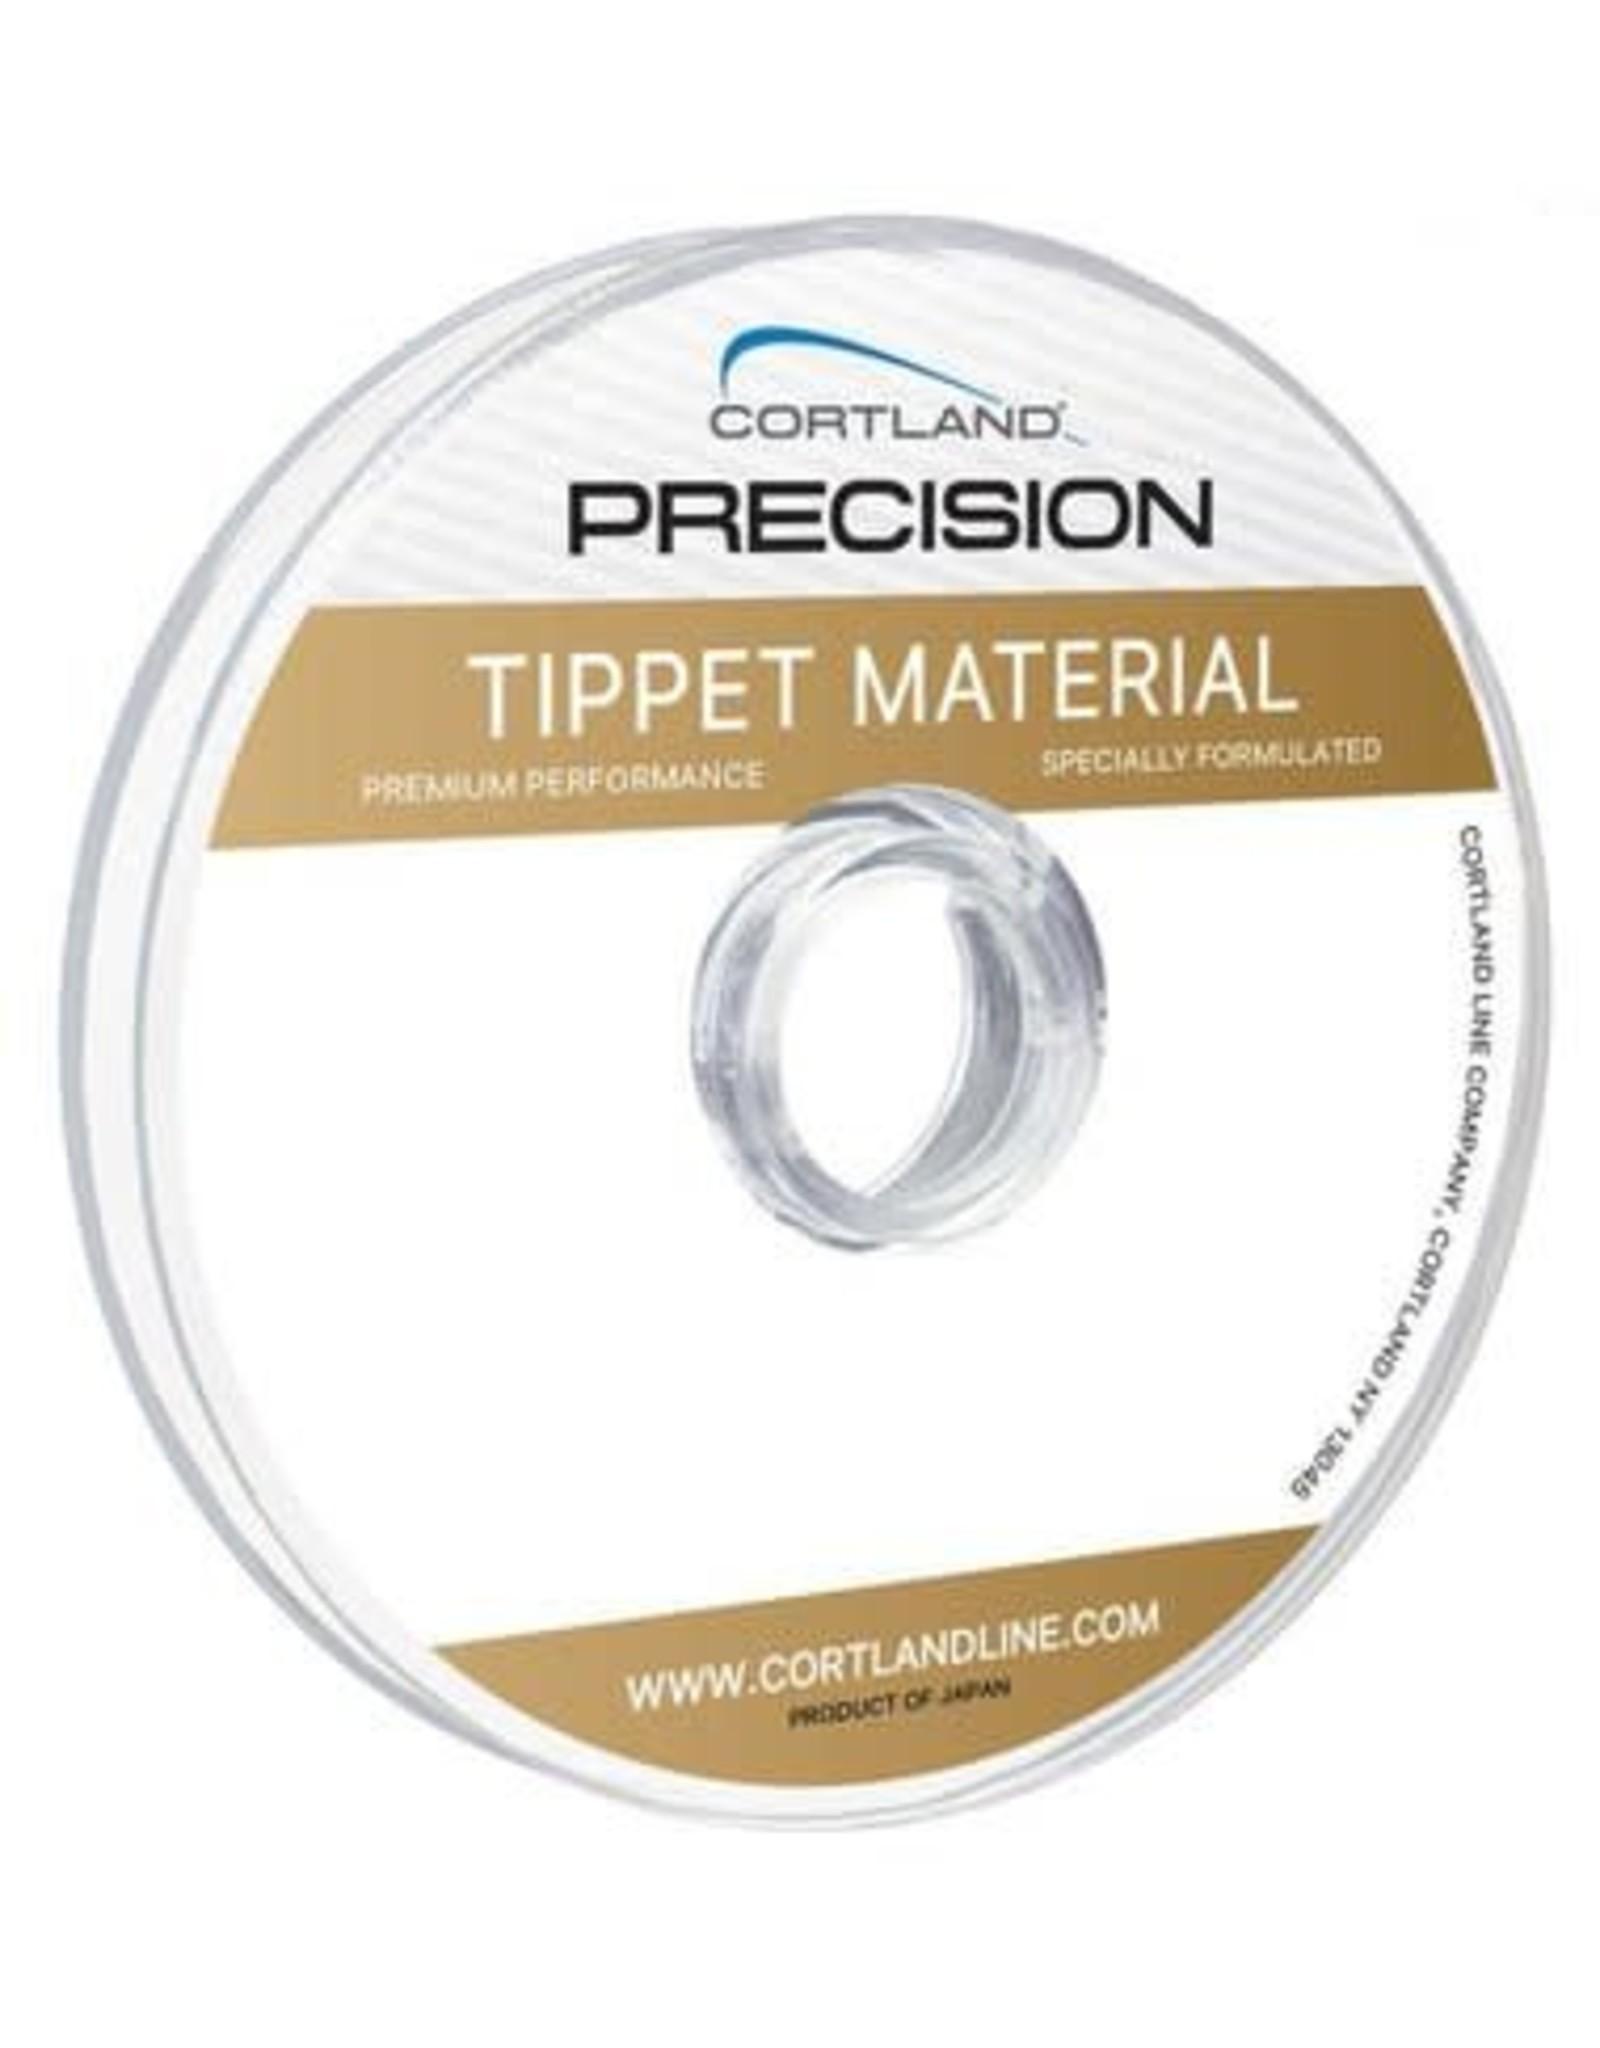 Cortland Cortland Precision Co-Polymer Tippet